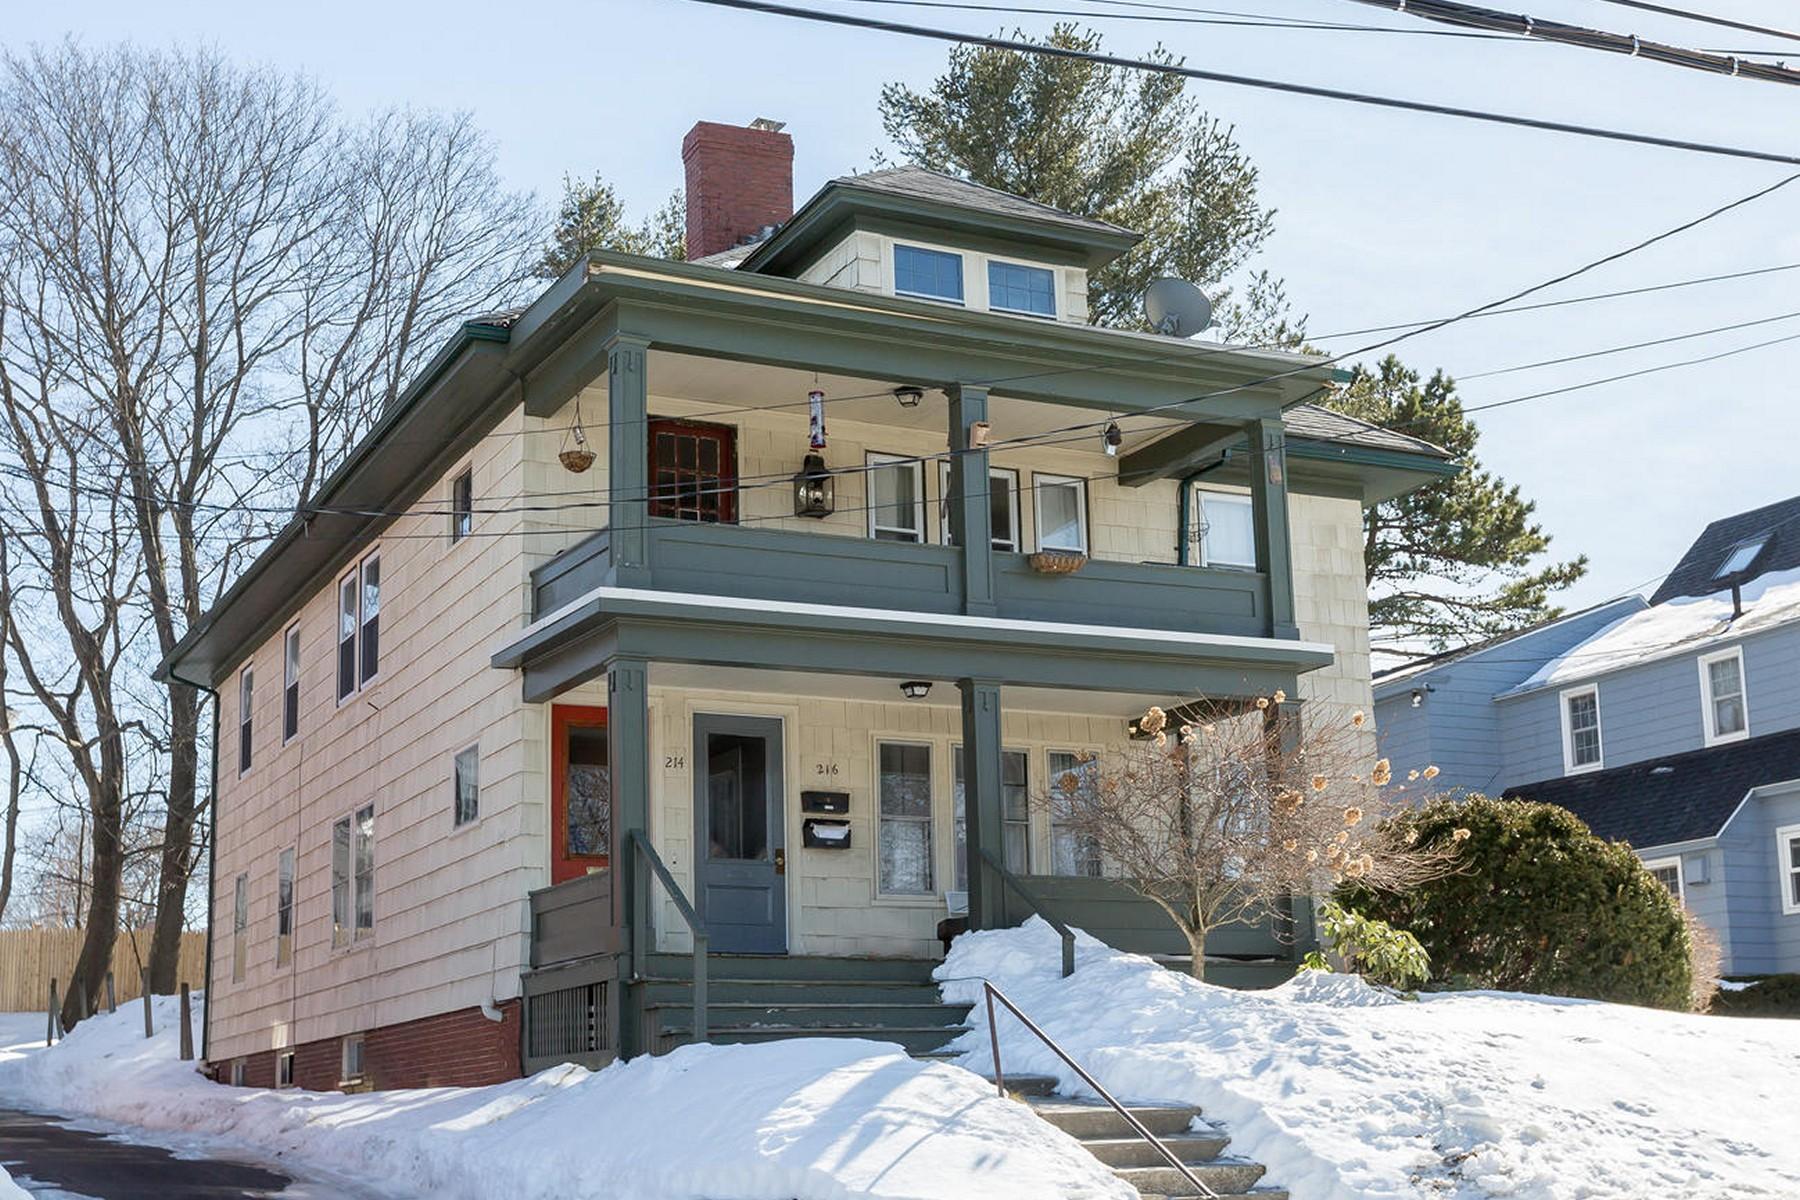 Duplex for Sale at Darmouth Street 214-216 Dartmouth Street Portland, Maine, 04103 United States